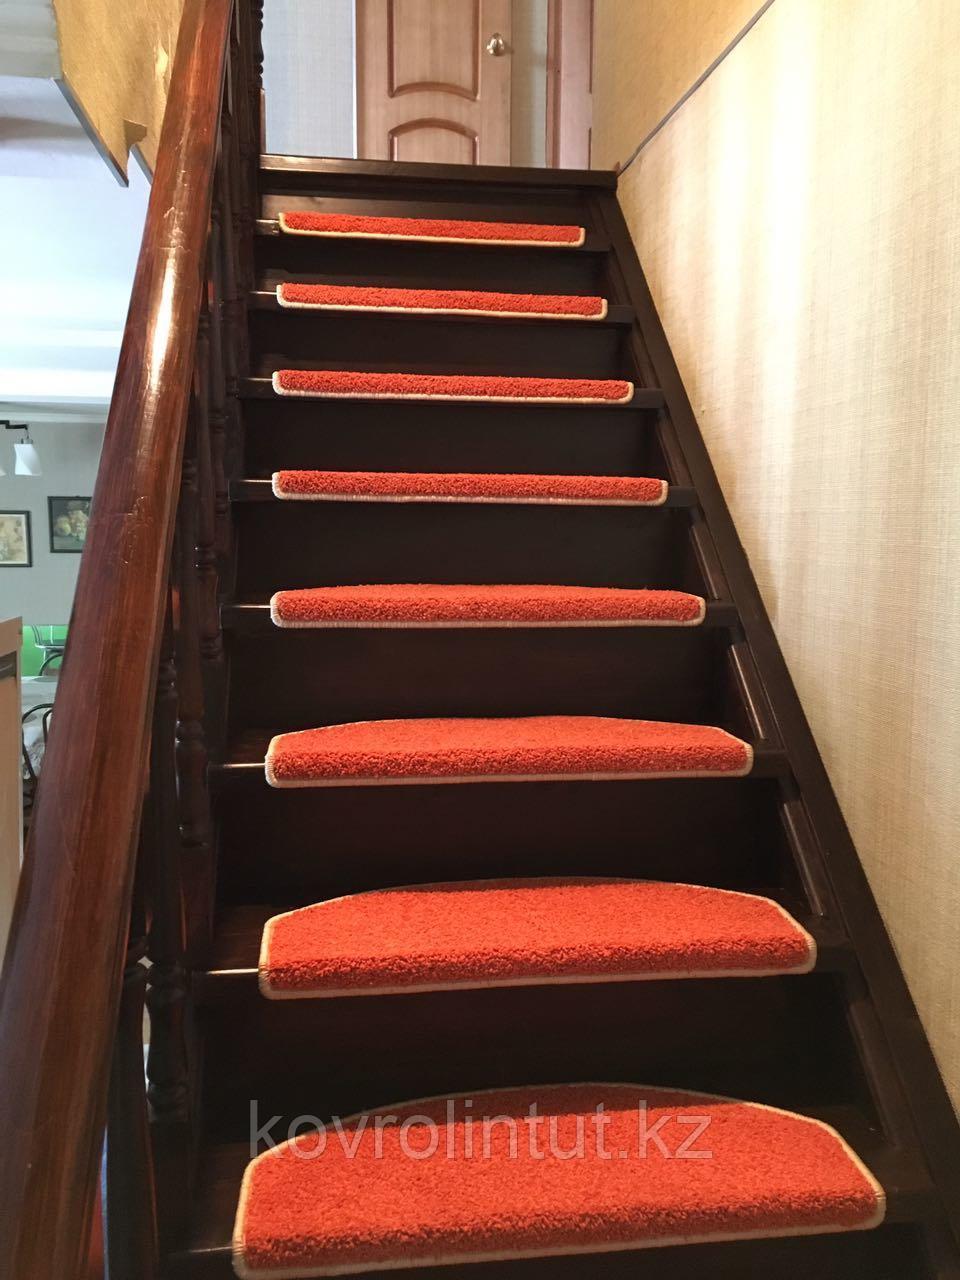 Коврики для лестниц  Ангара оранжевый 20*55  в розницу